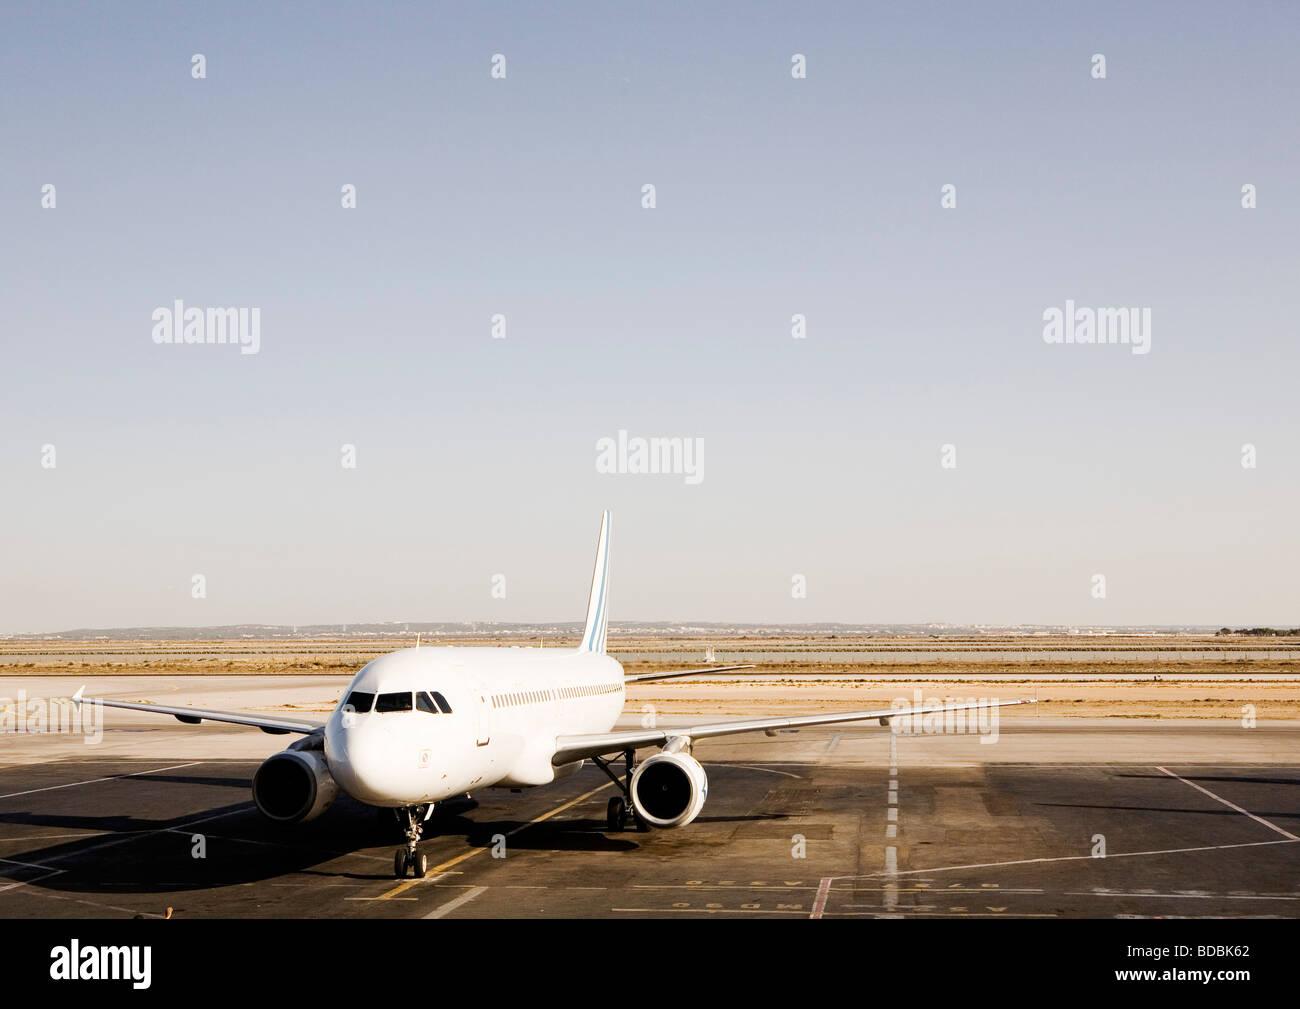 airplane on runway - Stock Image